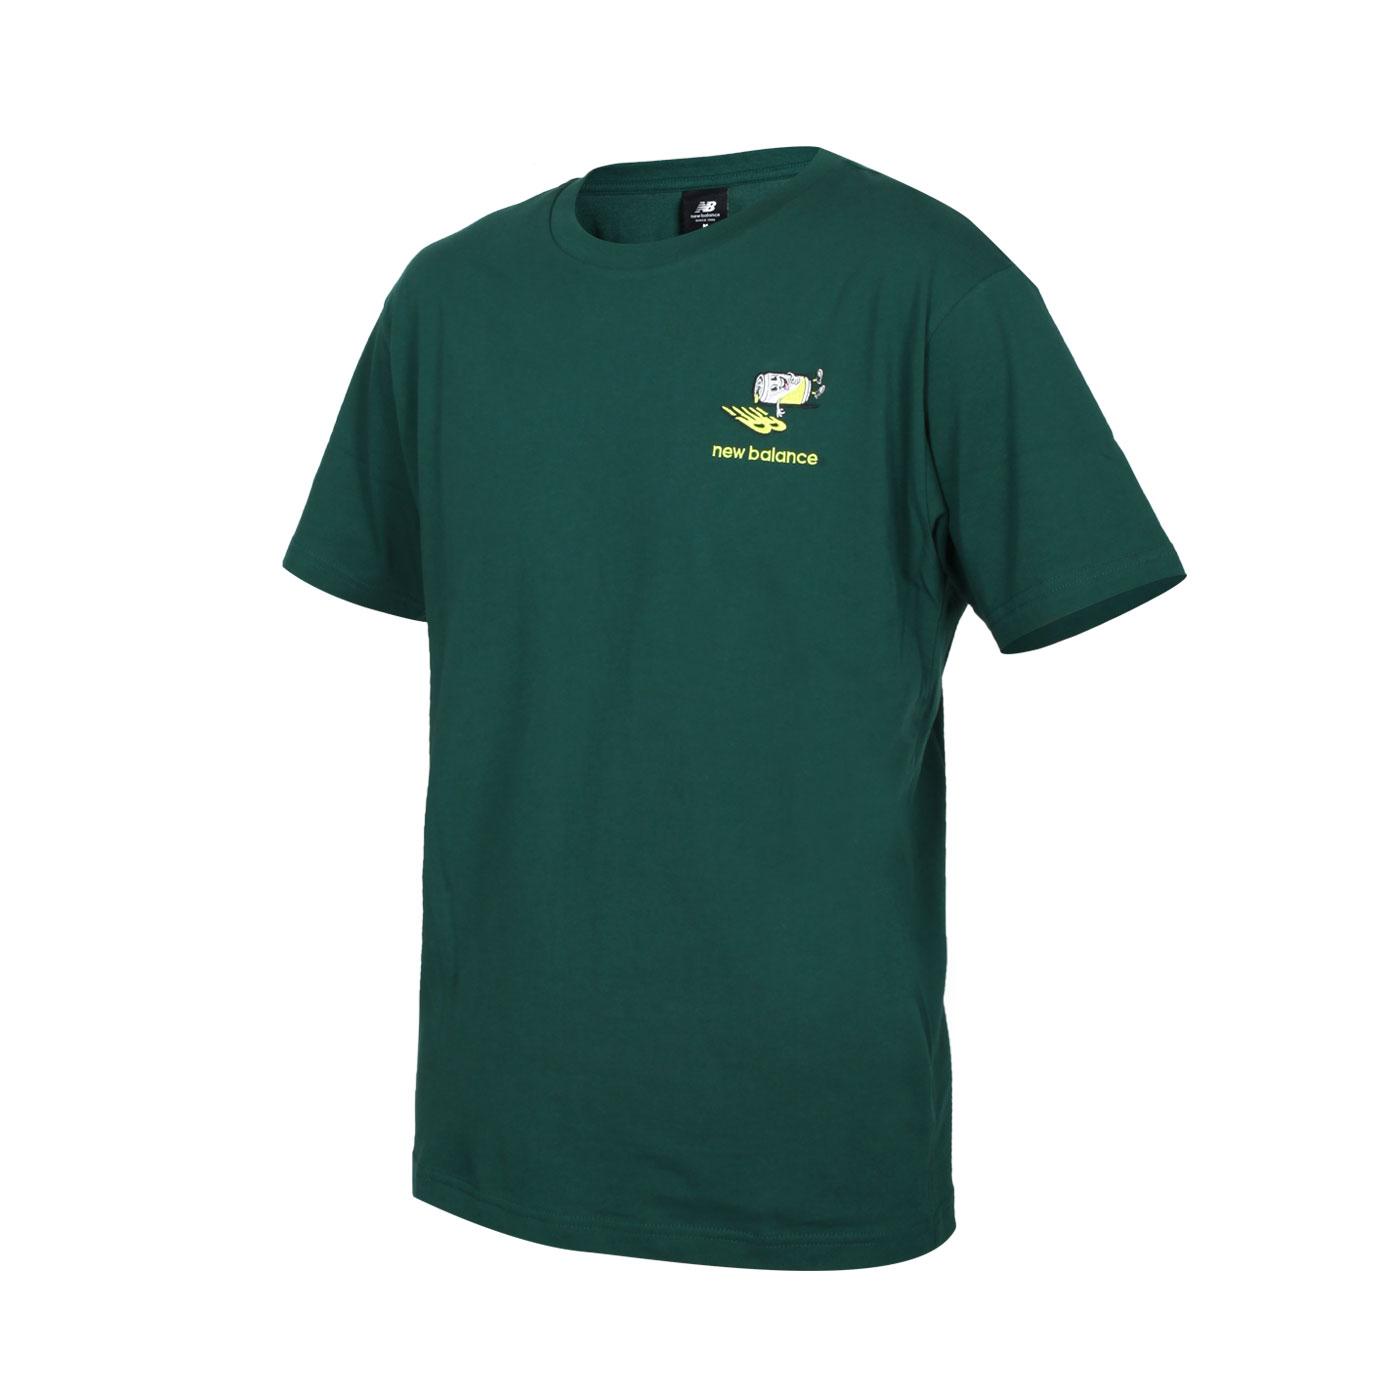 NEW BALANCE 男款短袖T恤 AMT13573NWG